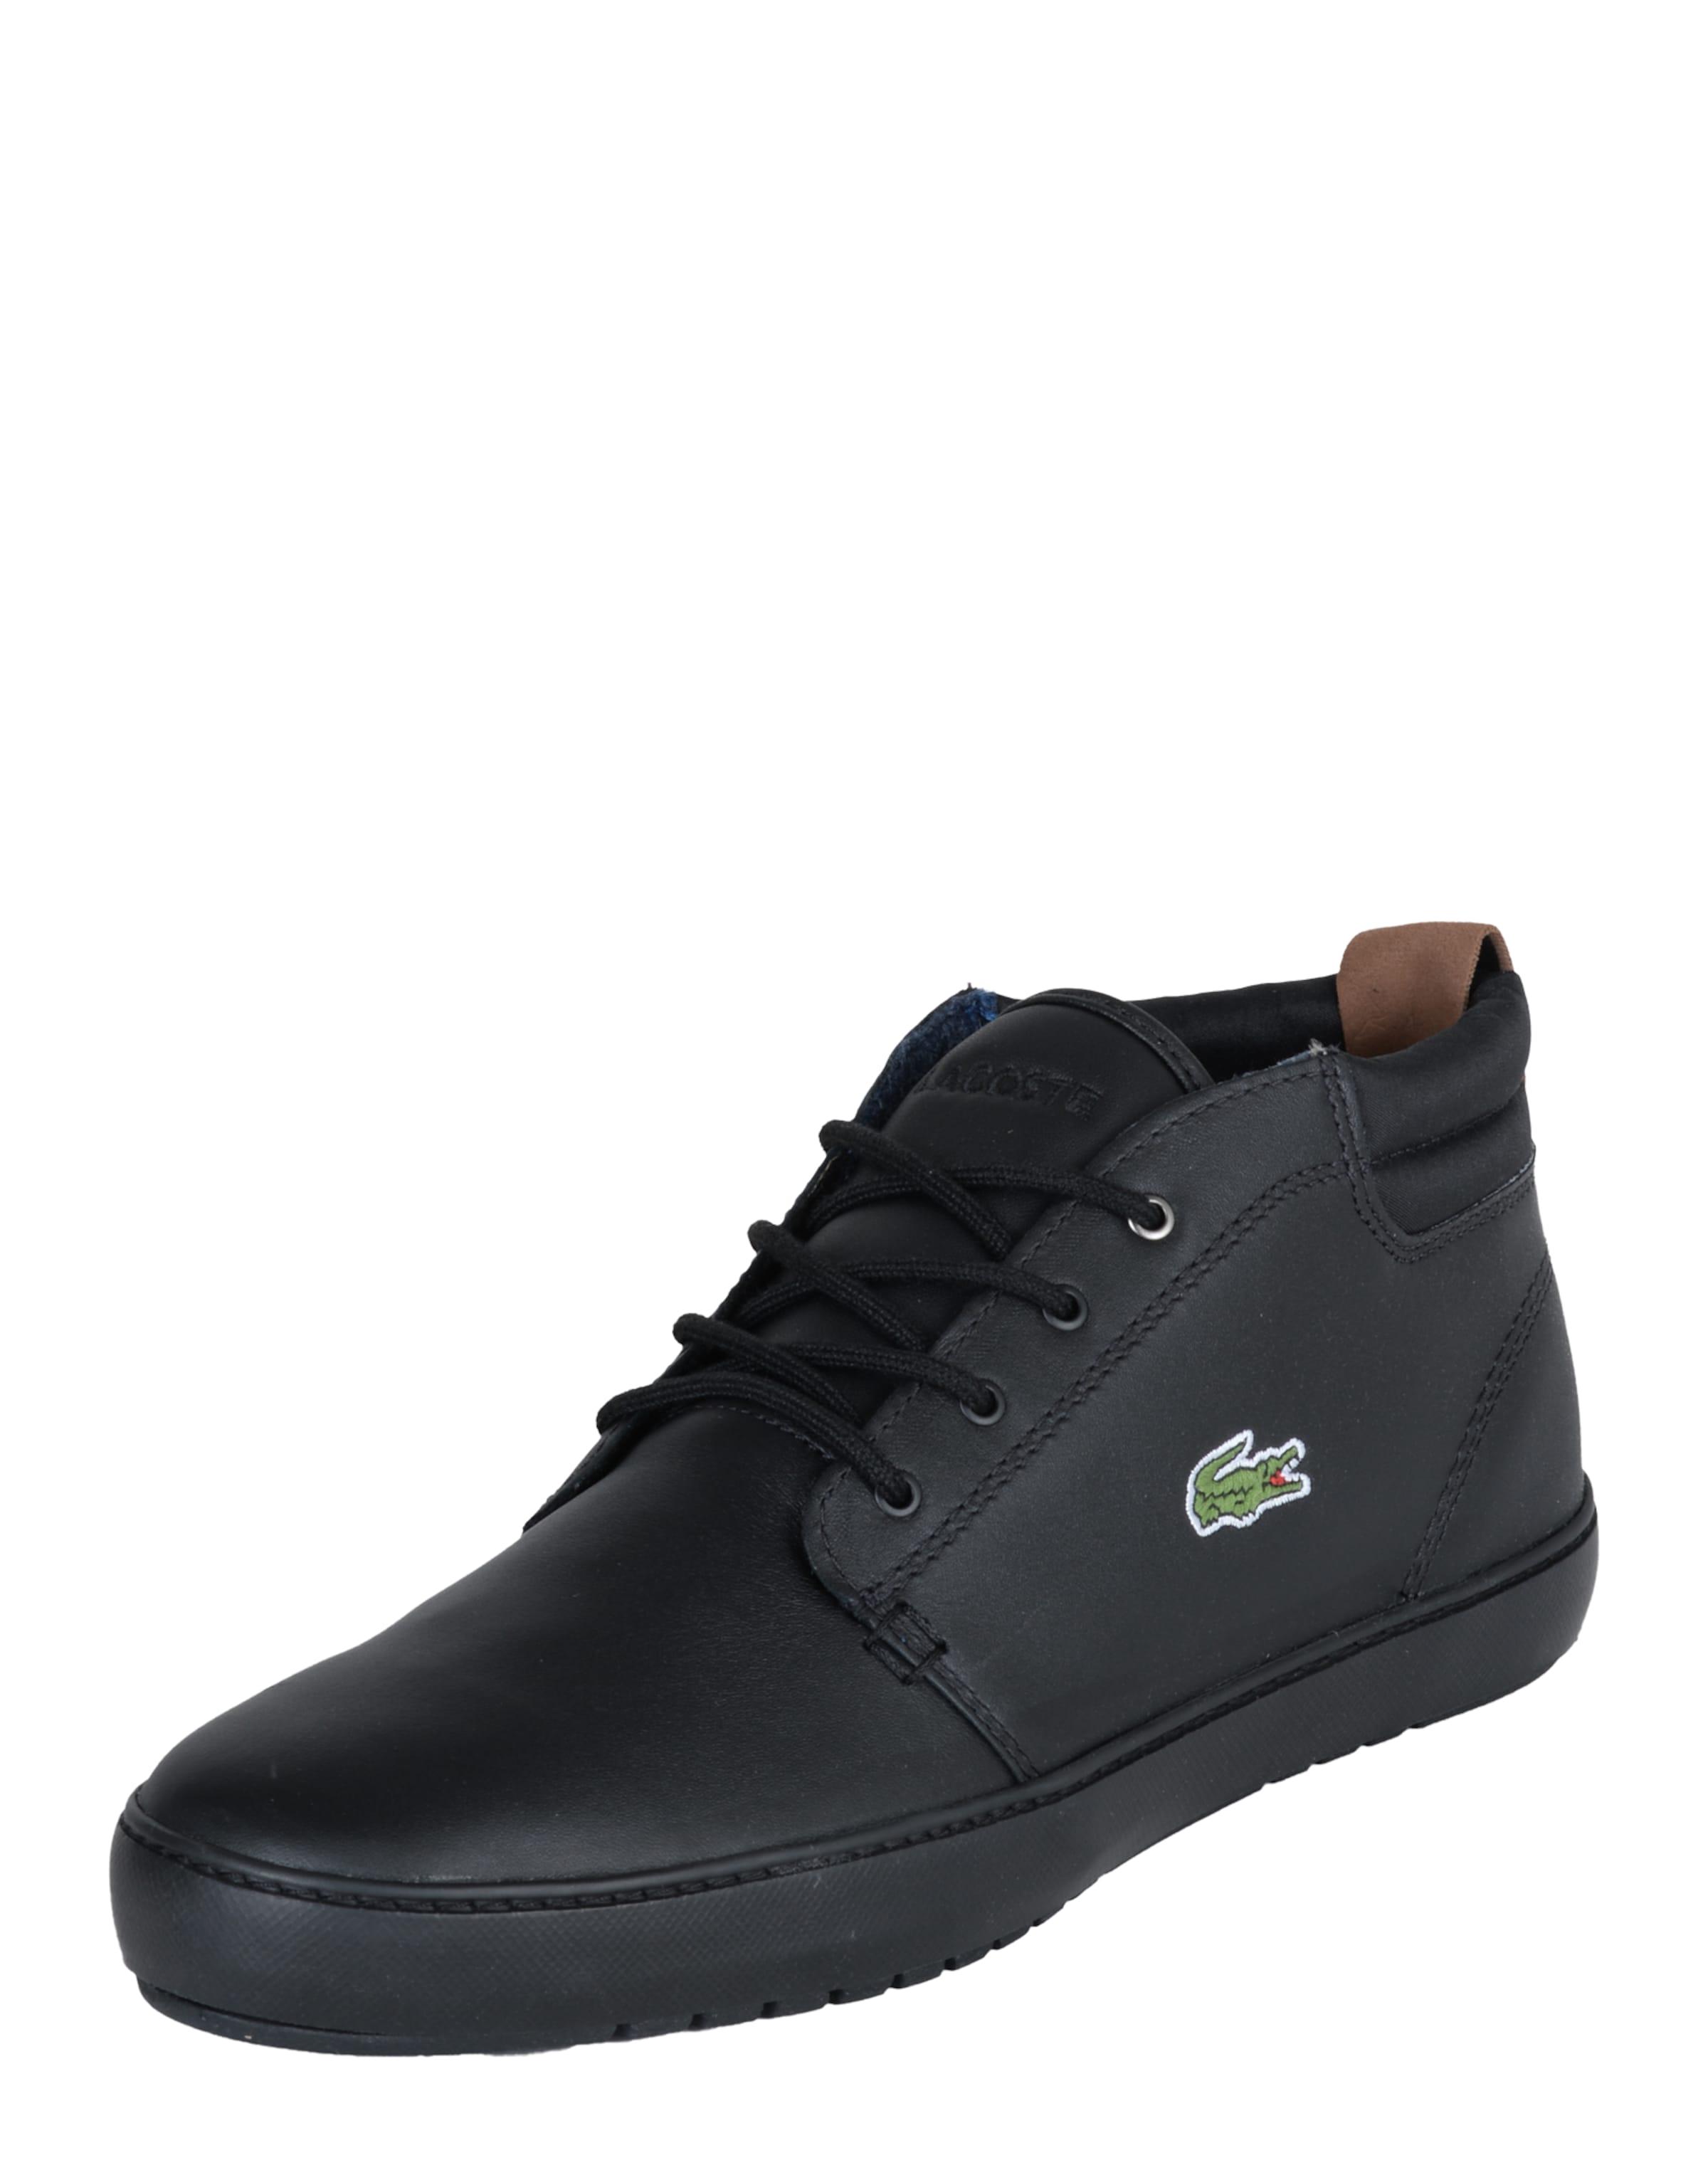 LACOSTE High Sneaker Ampthill Terra Hohe Qualität